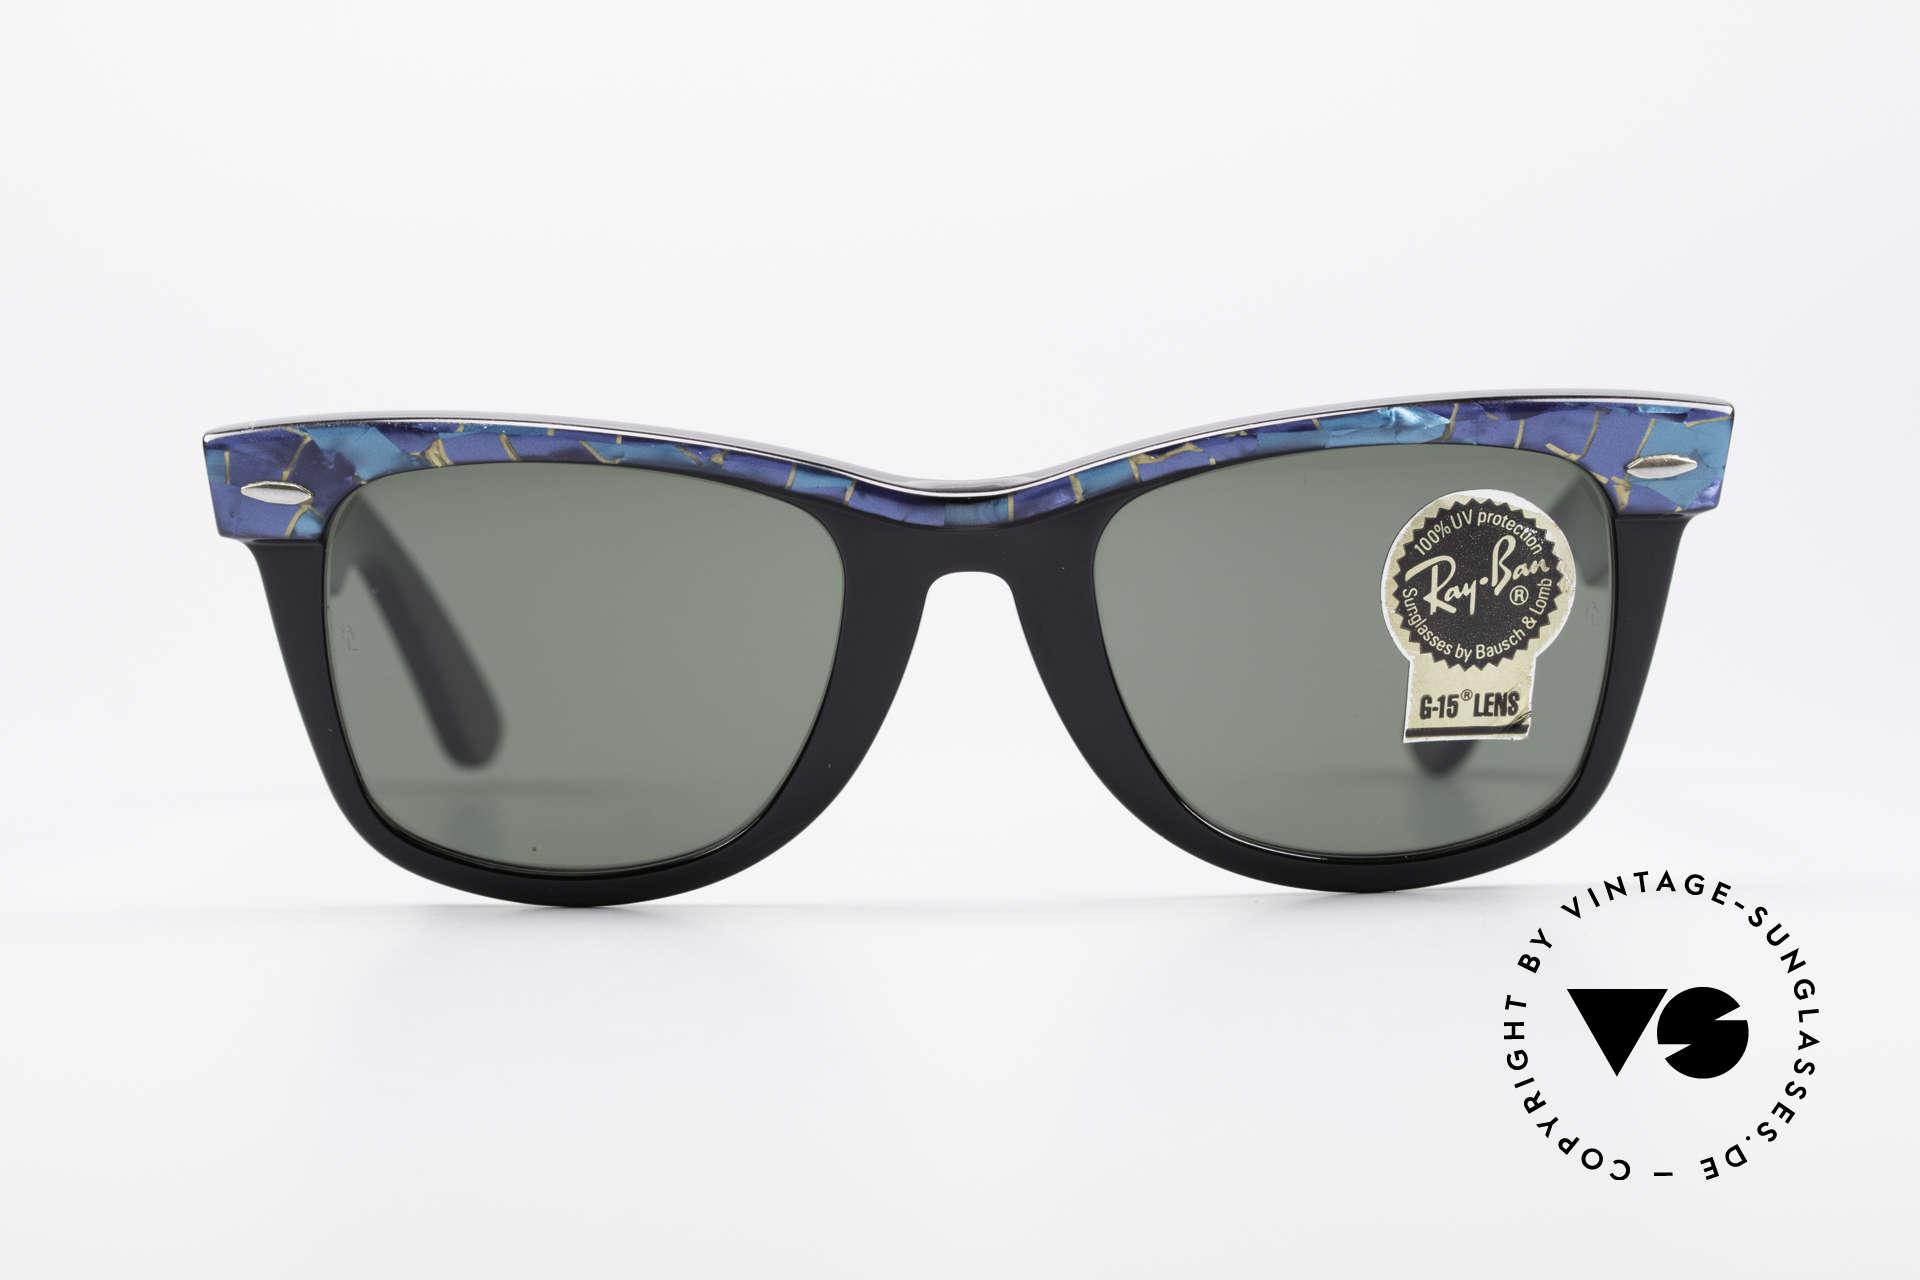 9edd0051d0 Sunglasses Ray Ban Wayfarer I Original Mosaic Wayfarer 80 s ...